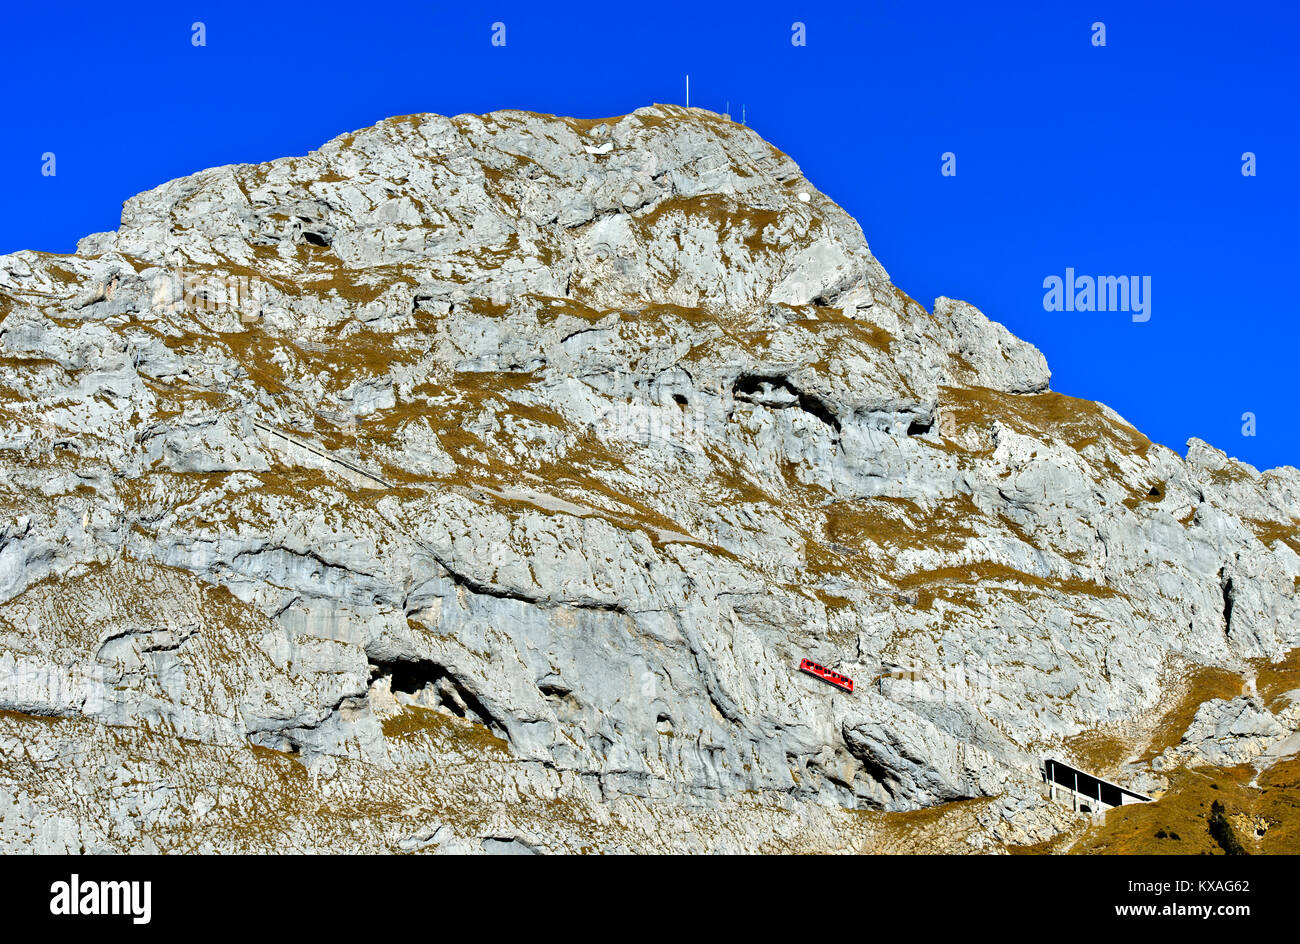 Red railcar of the Pilatus Railway on the steep railway line at Mount Pilatus,Alpnachstad,Switzerland - Stock Image